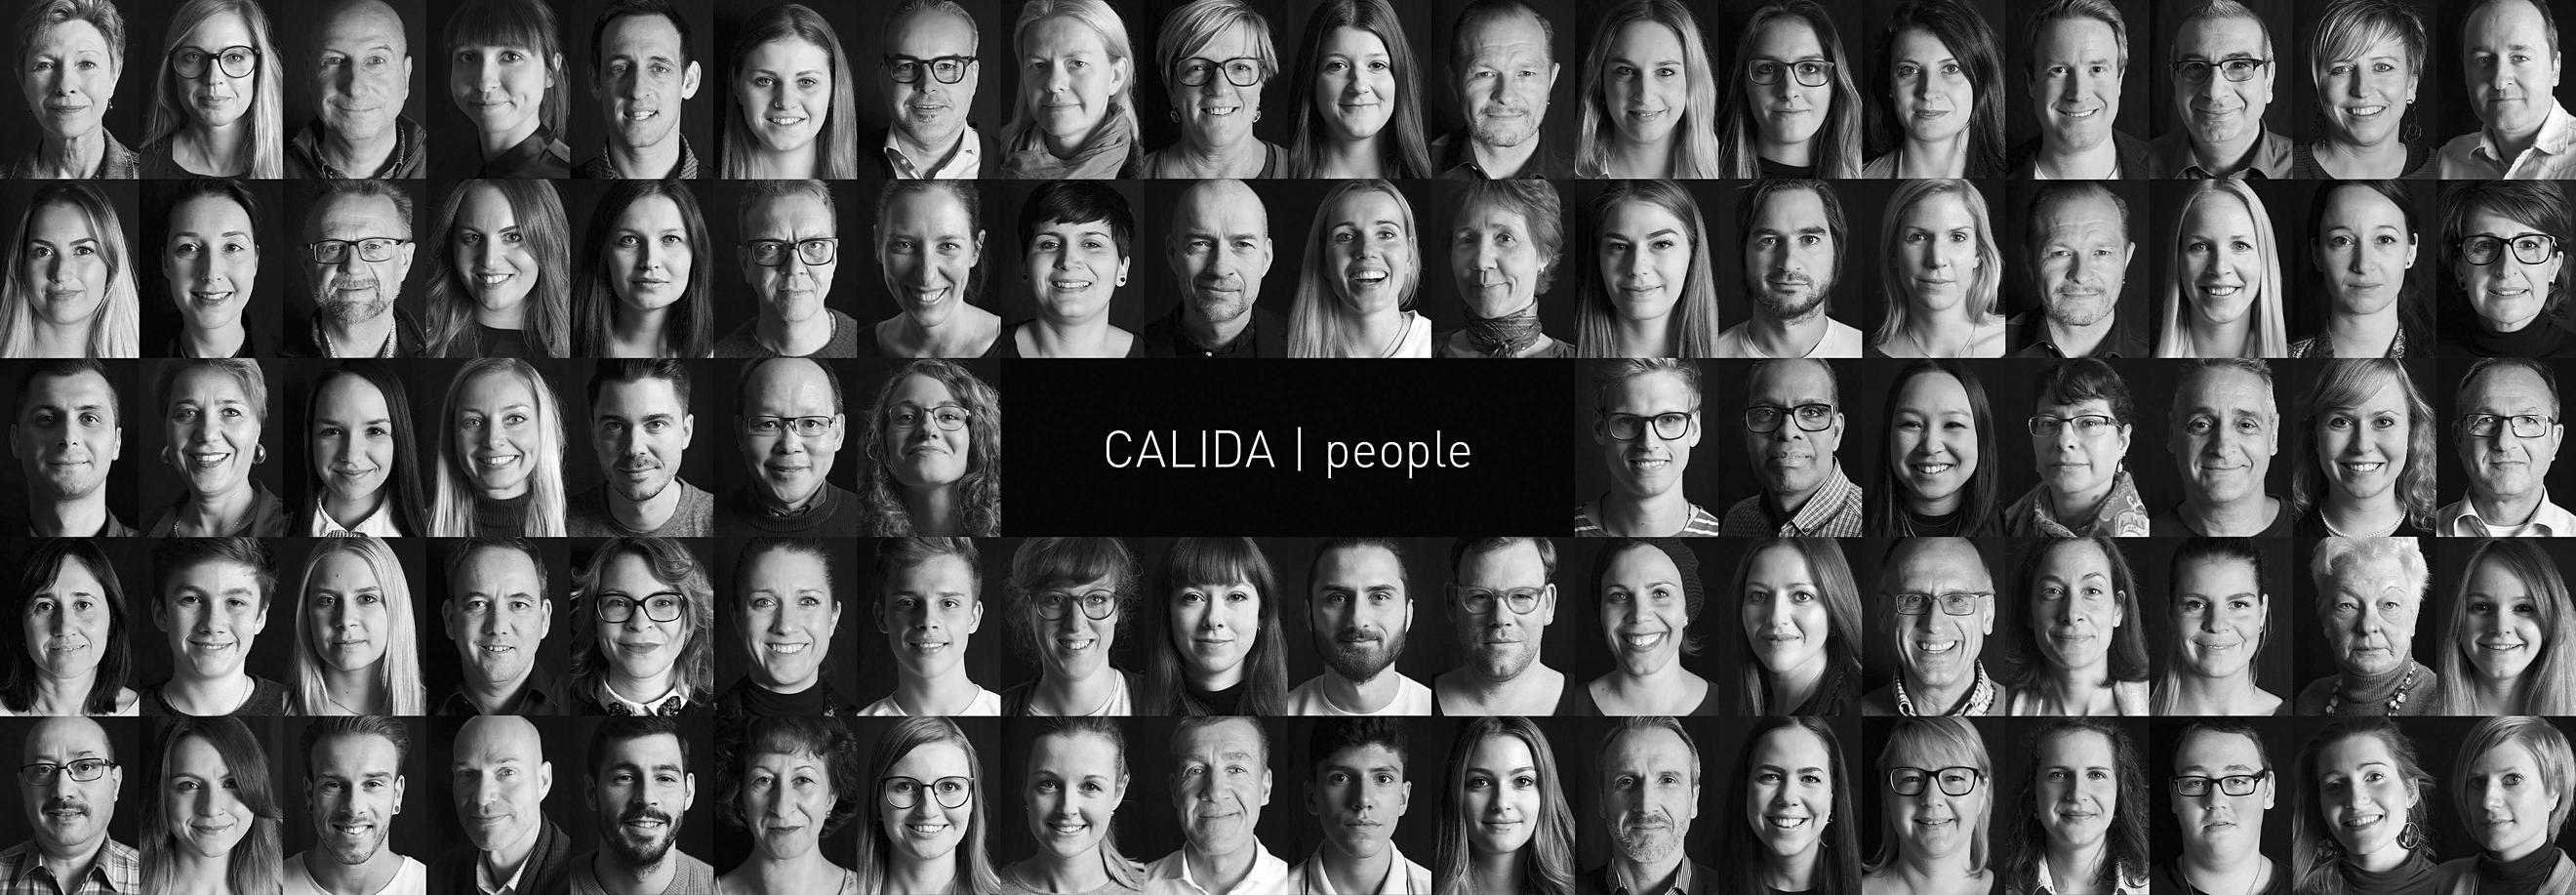 Unsere CALIDA Welt